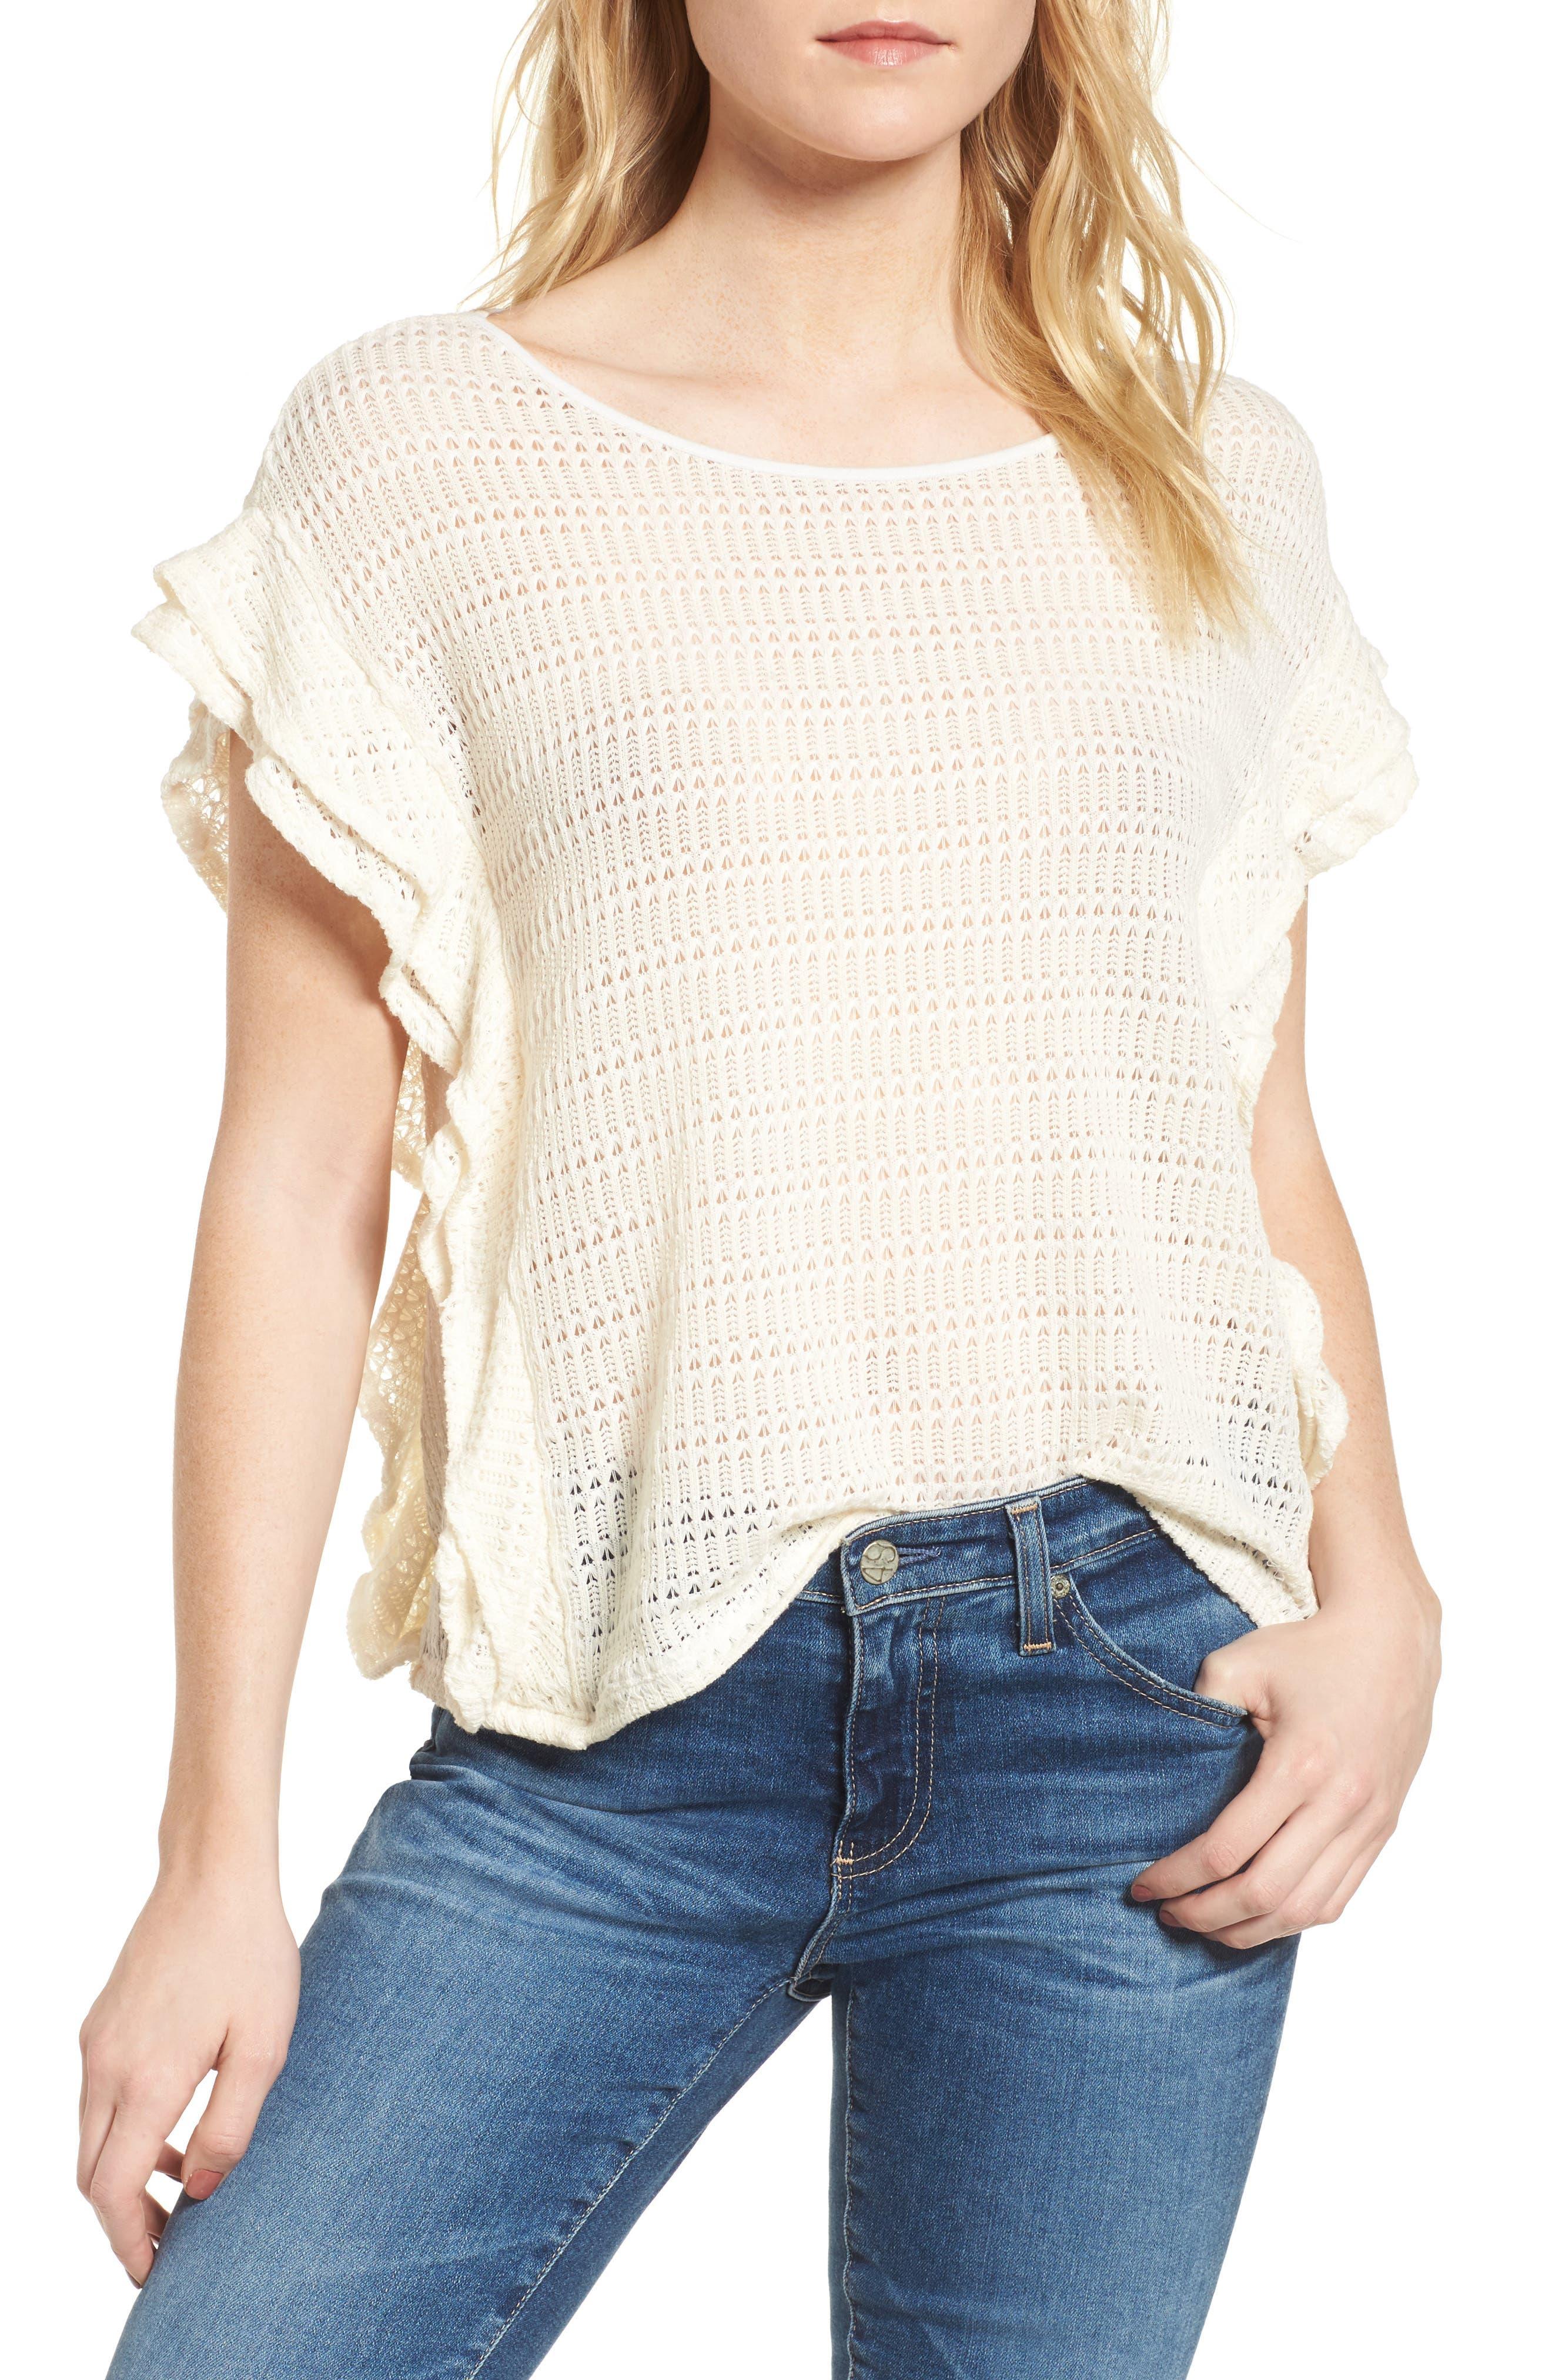 Alternate Image 1 Selected - Ella Moss Crochet Pullover Top